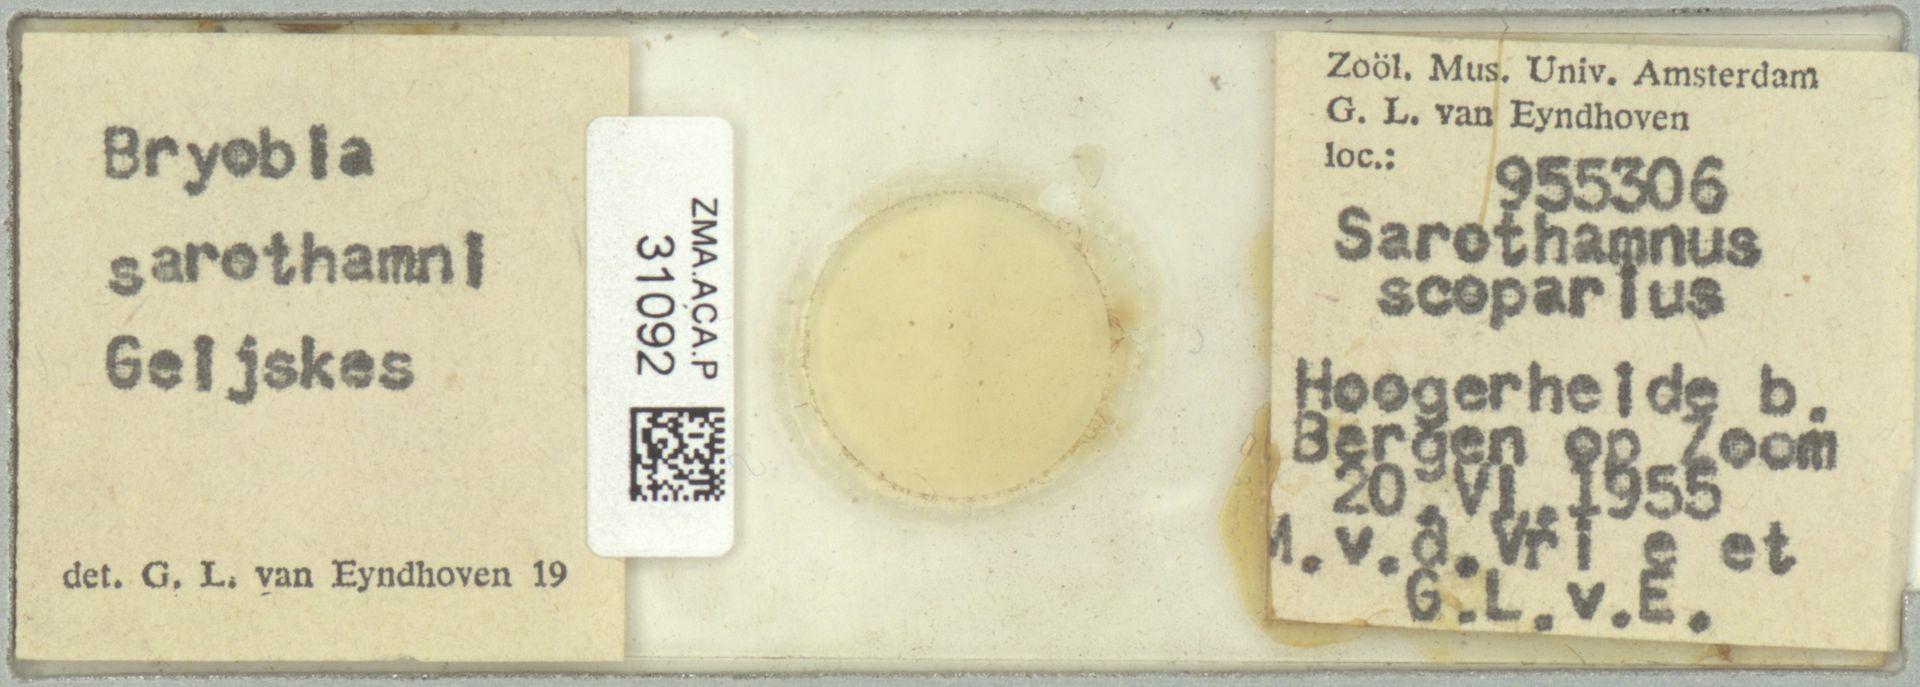 ZMA.ACA.P.31092 | Bryobia sarothamni Geijskes